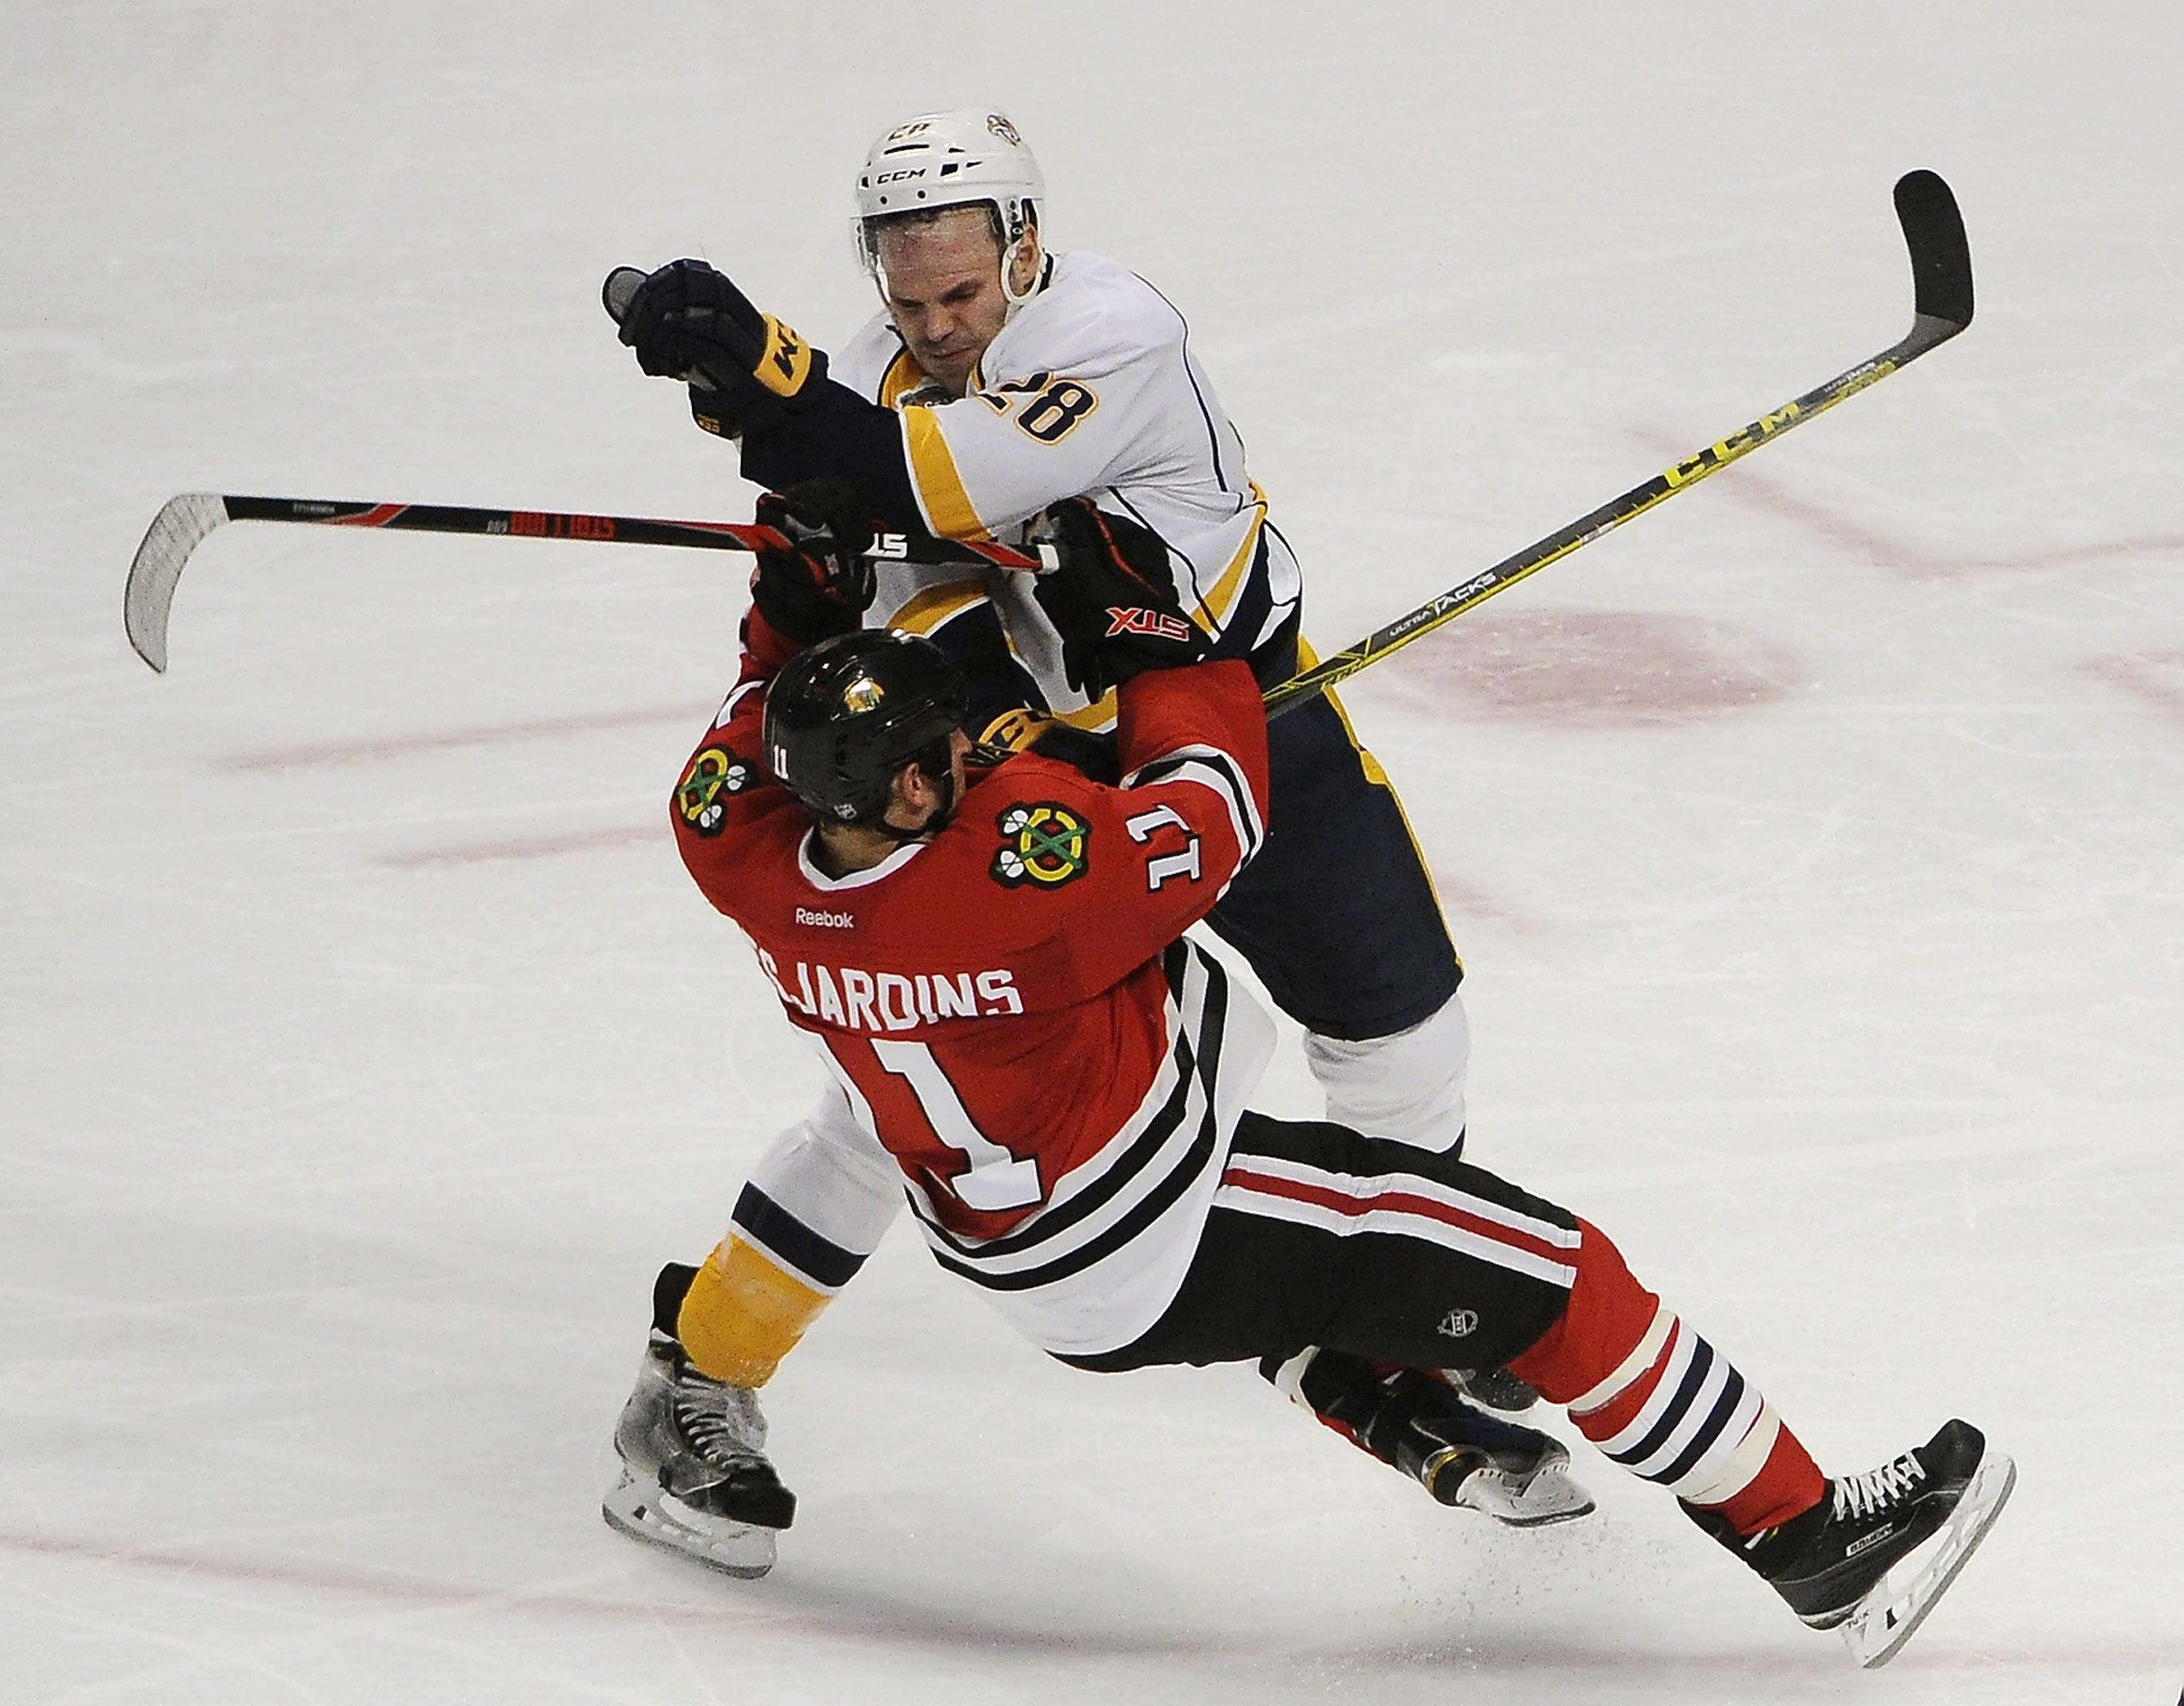 Nashville Predators center Paul Gaustad (28) checks Chicago Blackhawks center Andrew Desjardins (11) duiring the second period of an NHL hockey game Thursday, Feb. 25, 2016, in Chicago. (AP Photo/David Banks)